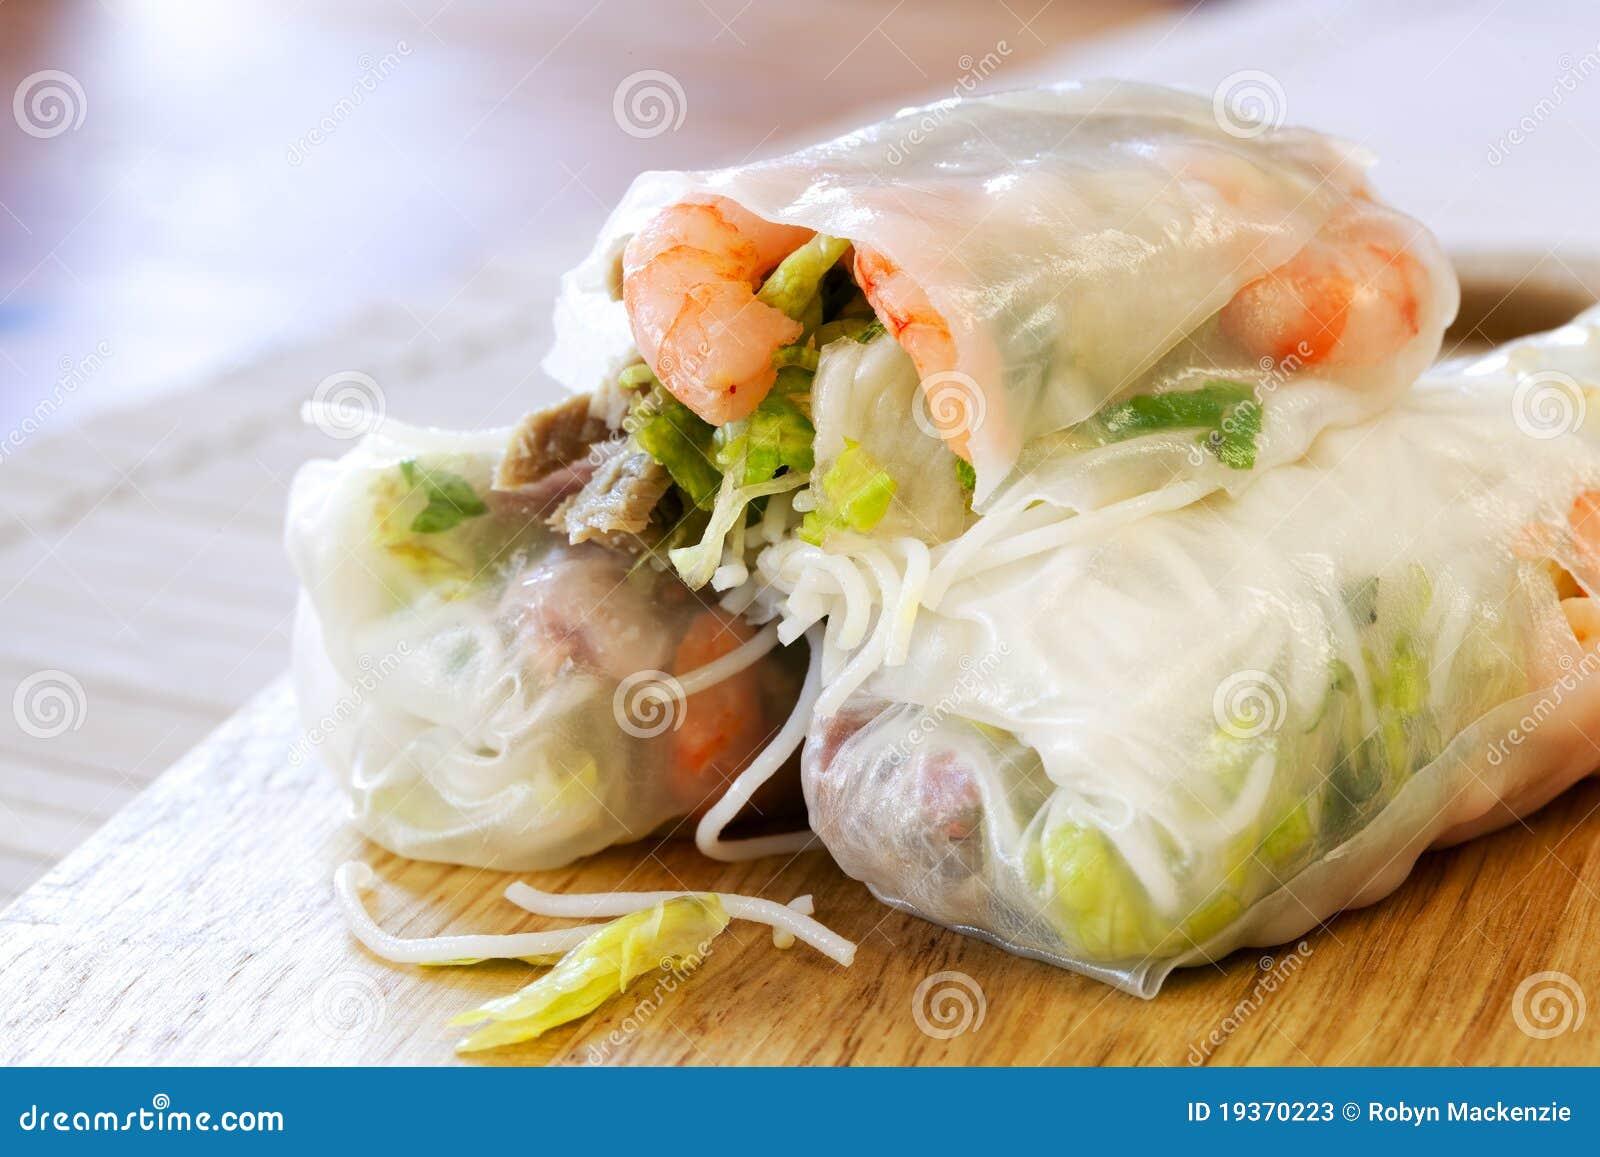 Papel de arroz Rolls